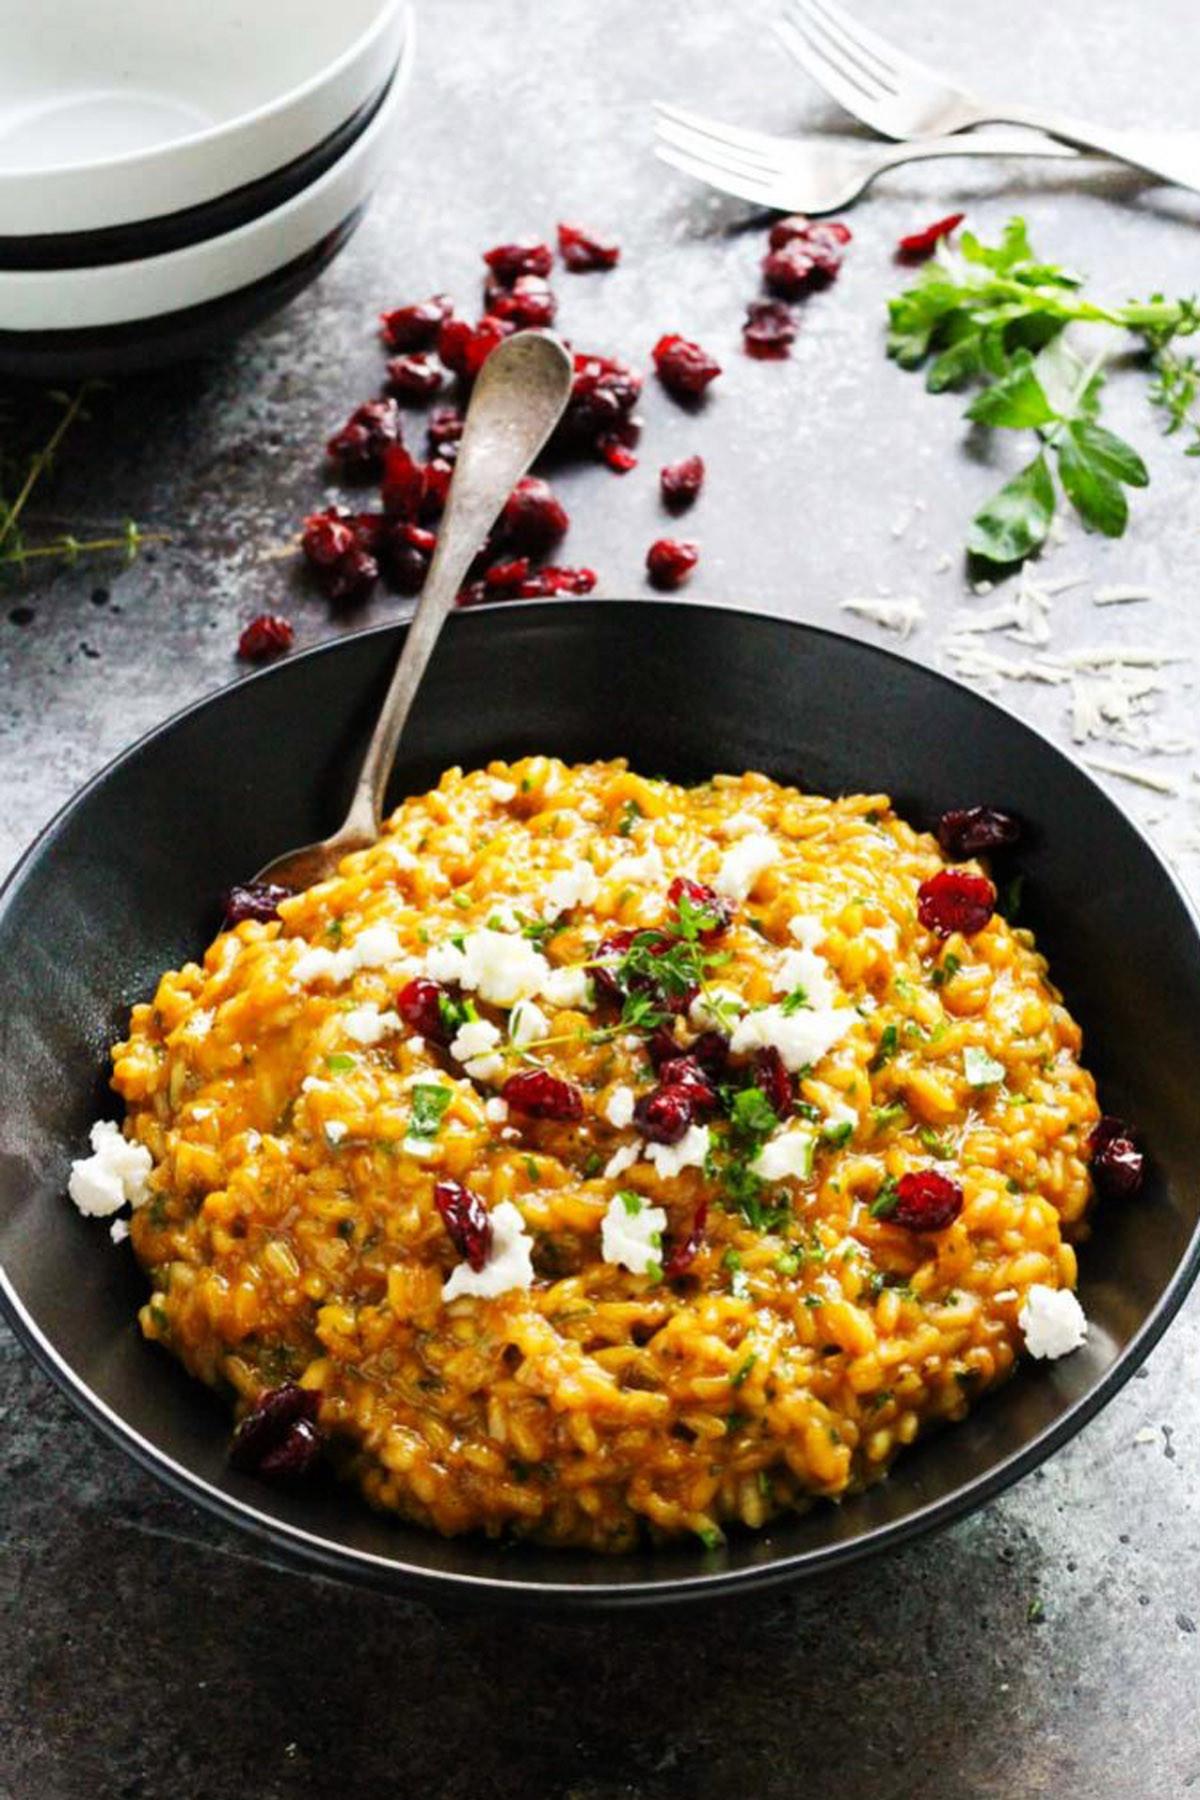 Fall Dinner Ideas  25 Easy Fall Dinner Ideas Best Dinner Recipes for Autumn